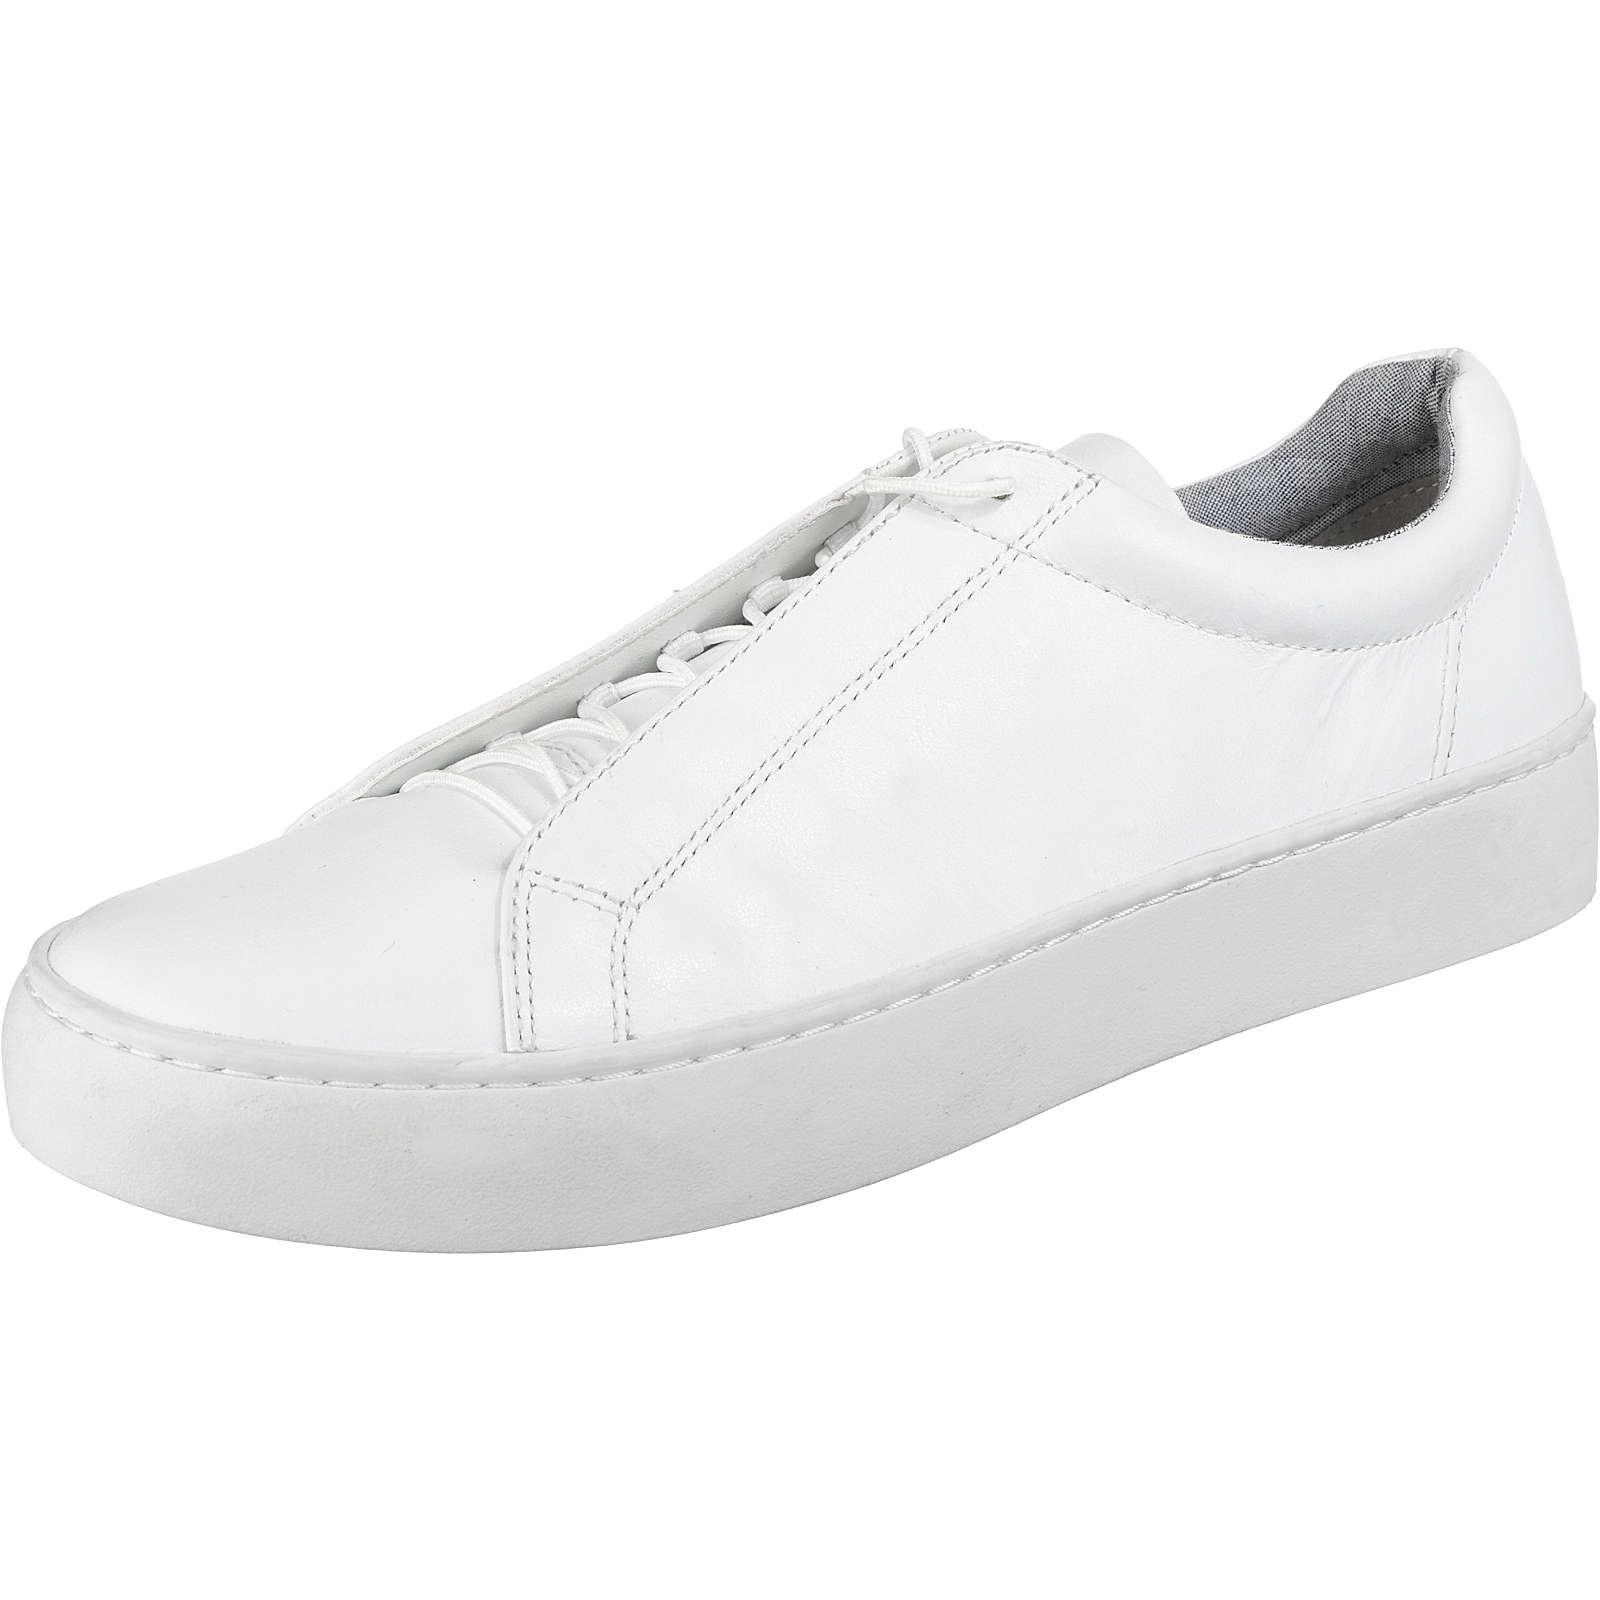 VAGABOND Zoe Sneakers Low weiß Damen Gr. 39